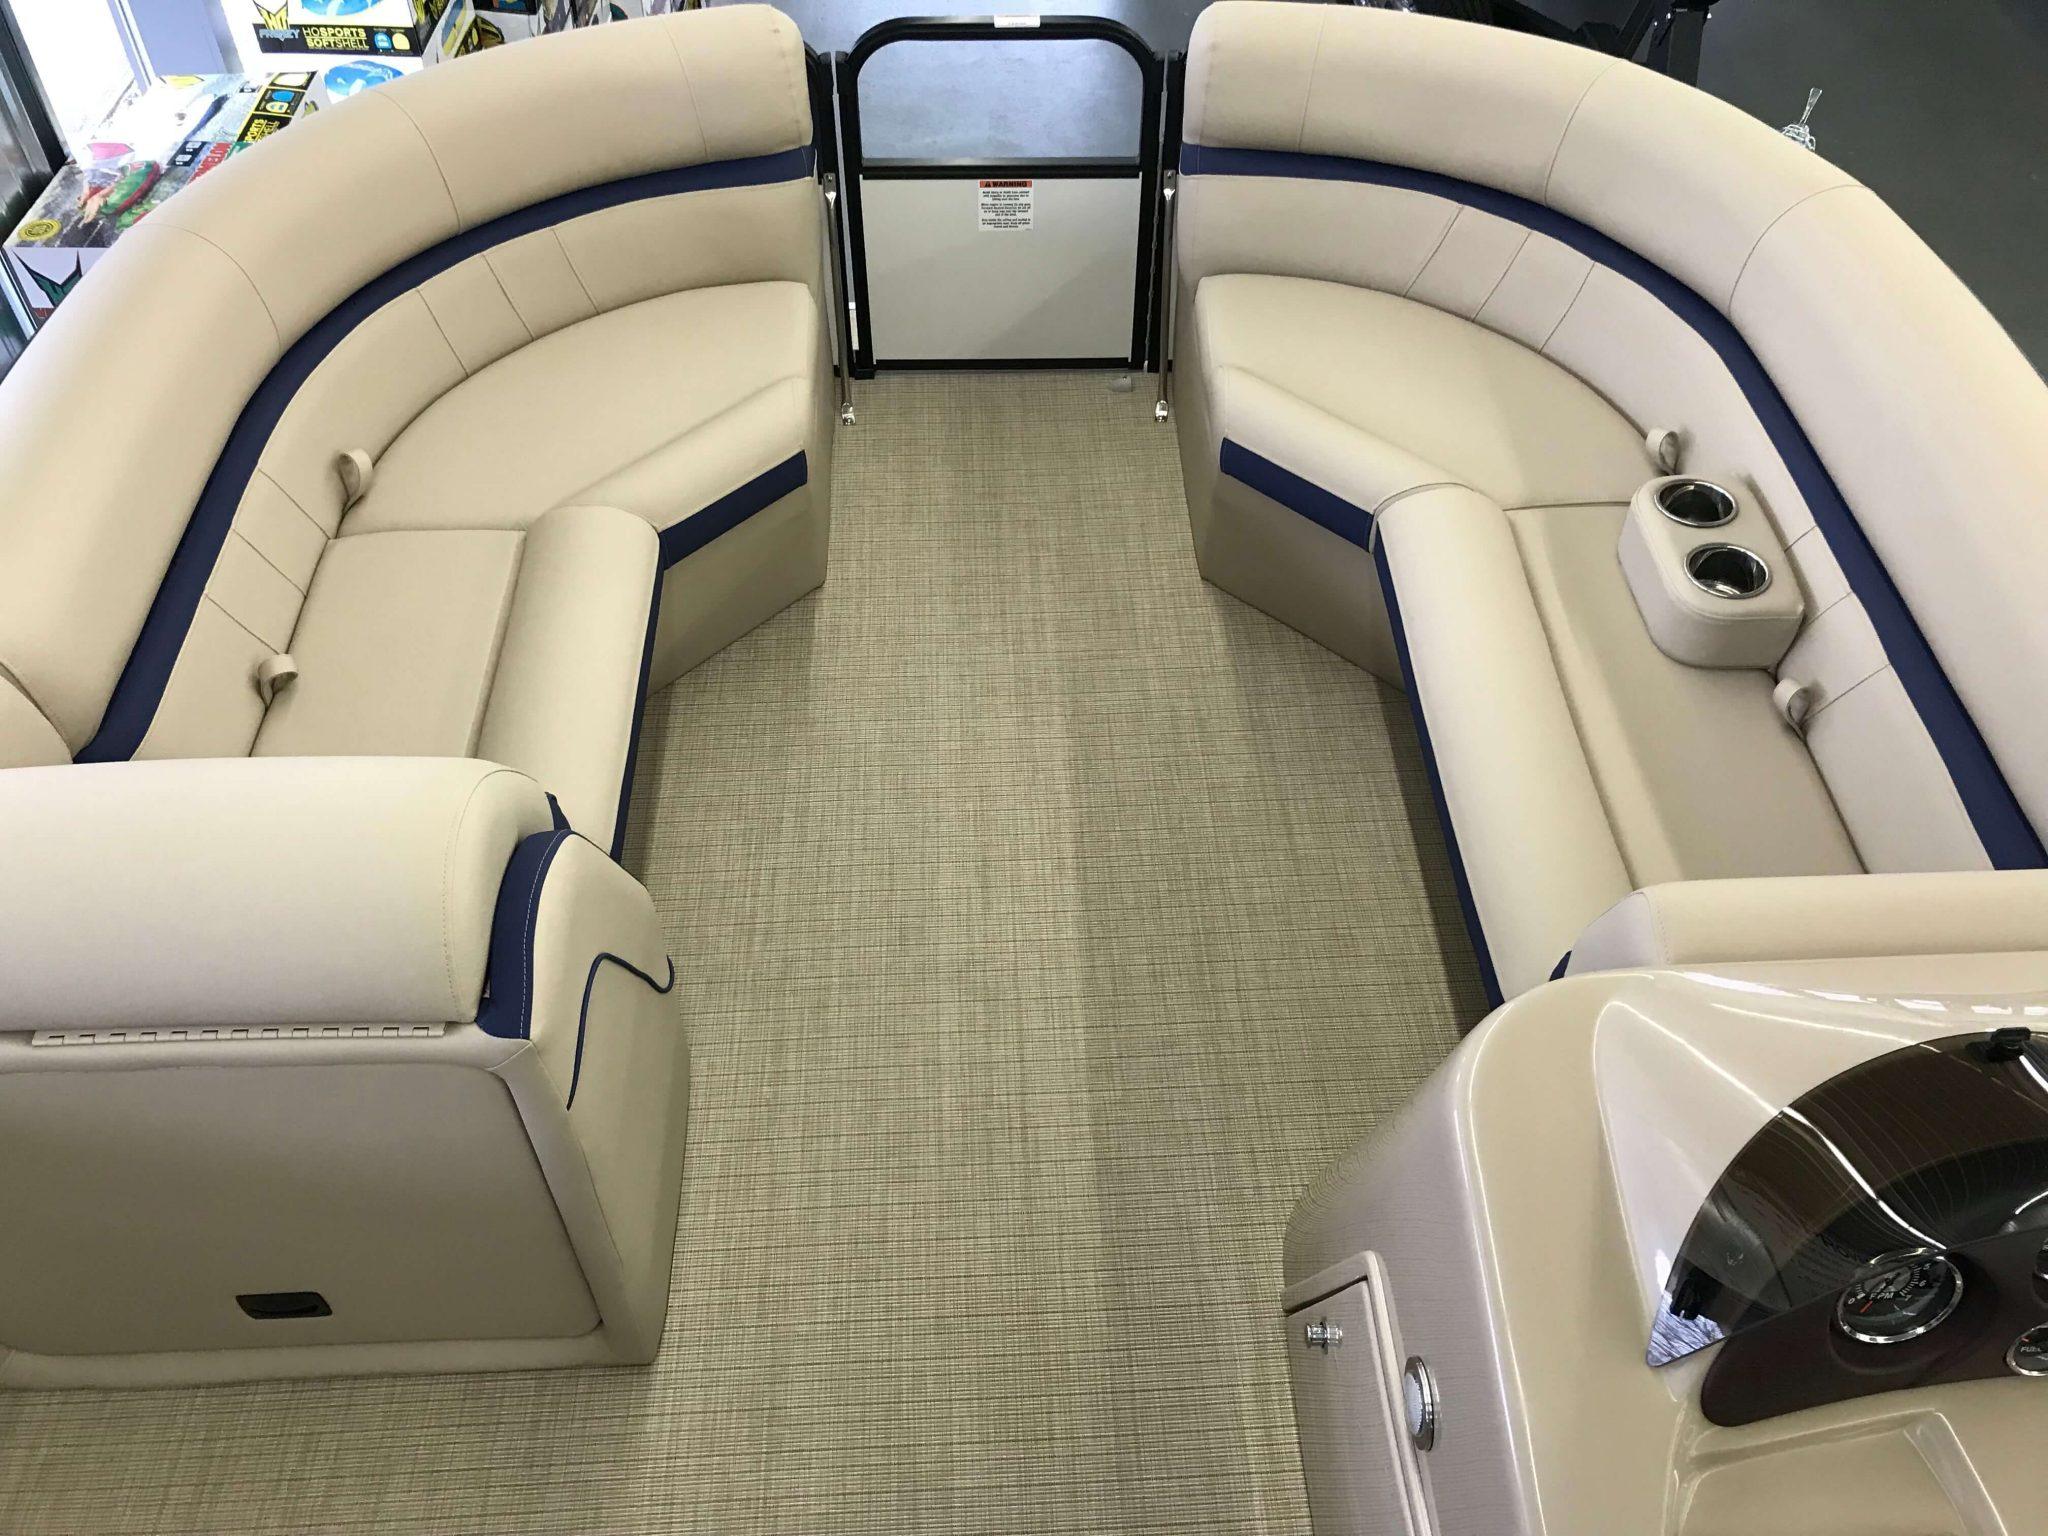 2019 Berkshire 24RFX CTS 3.0 Tritoon Interior Bow Seating 1